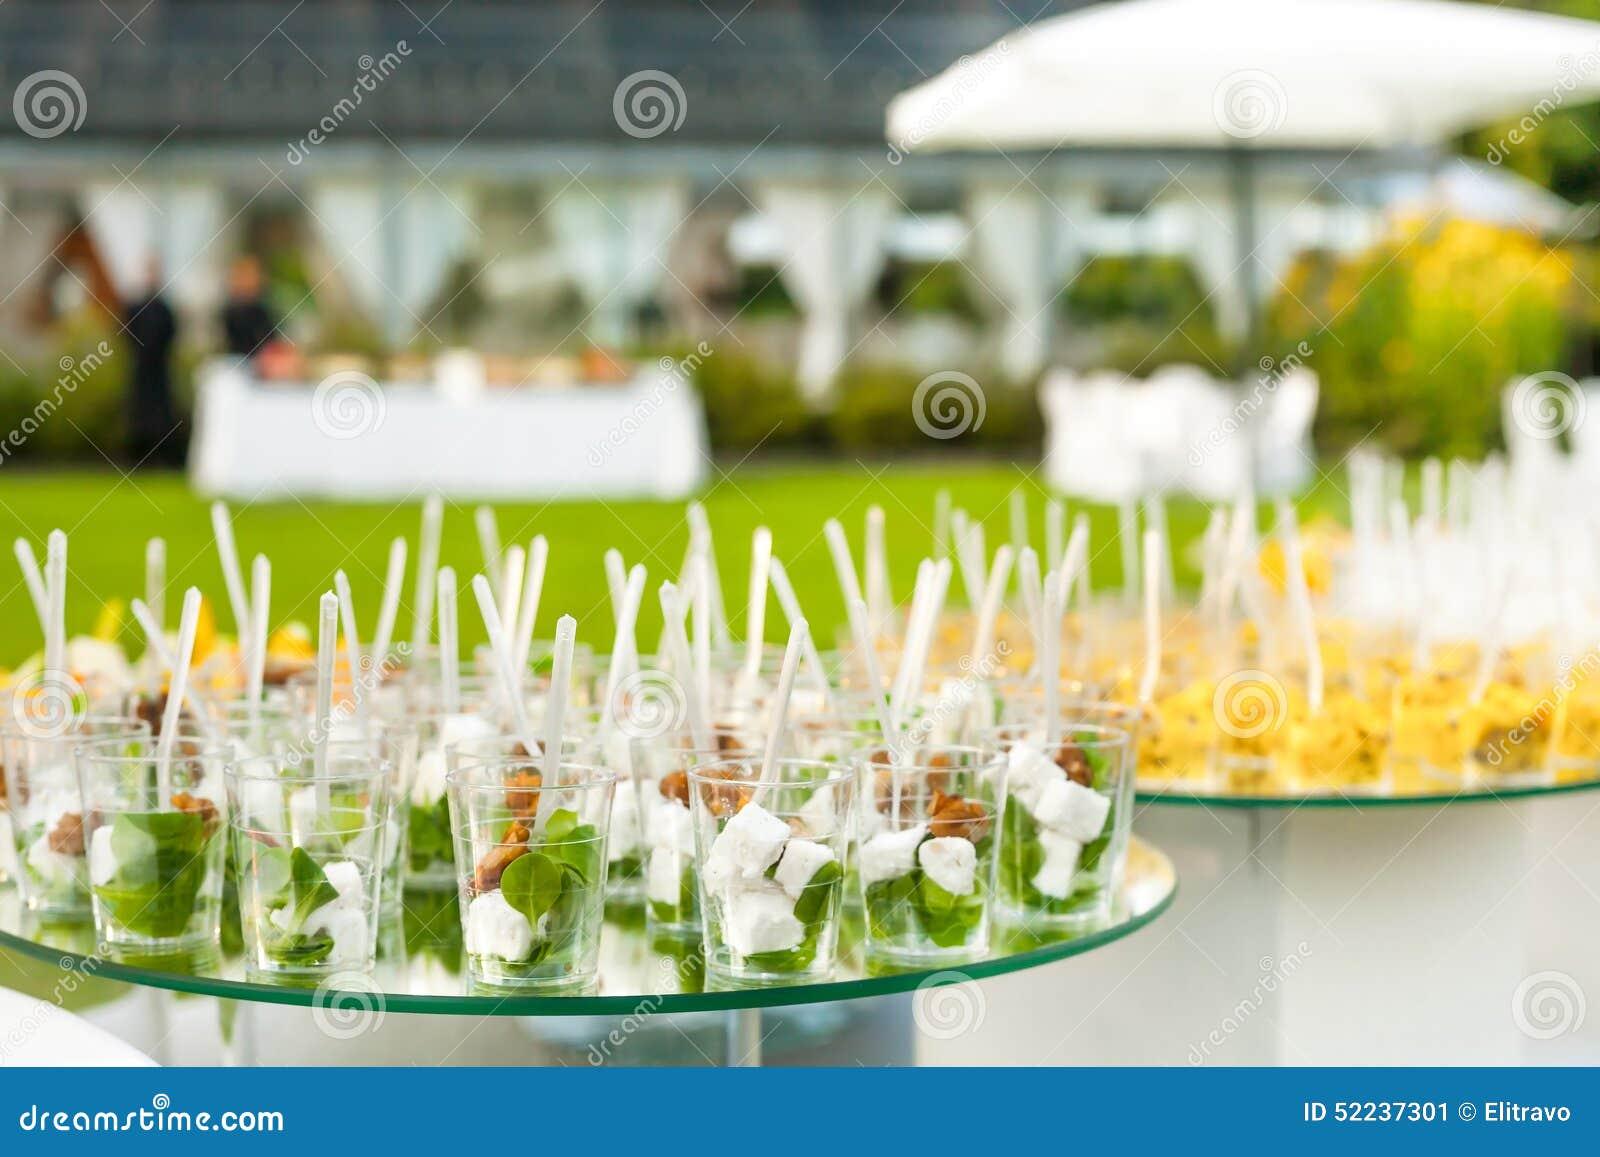 elegant appetizers stock image image of freshness fresh 52237301